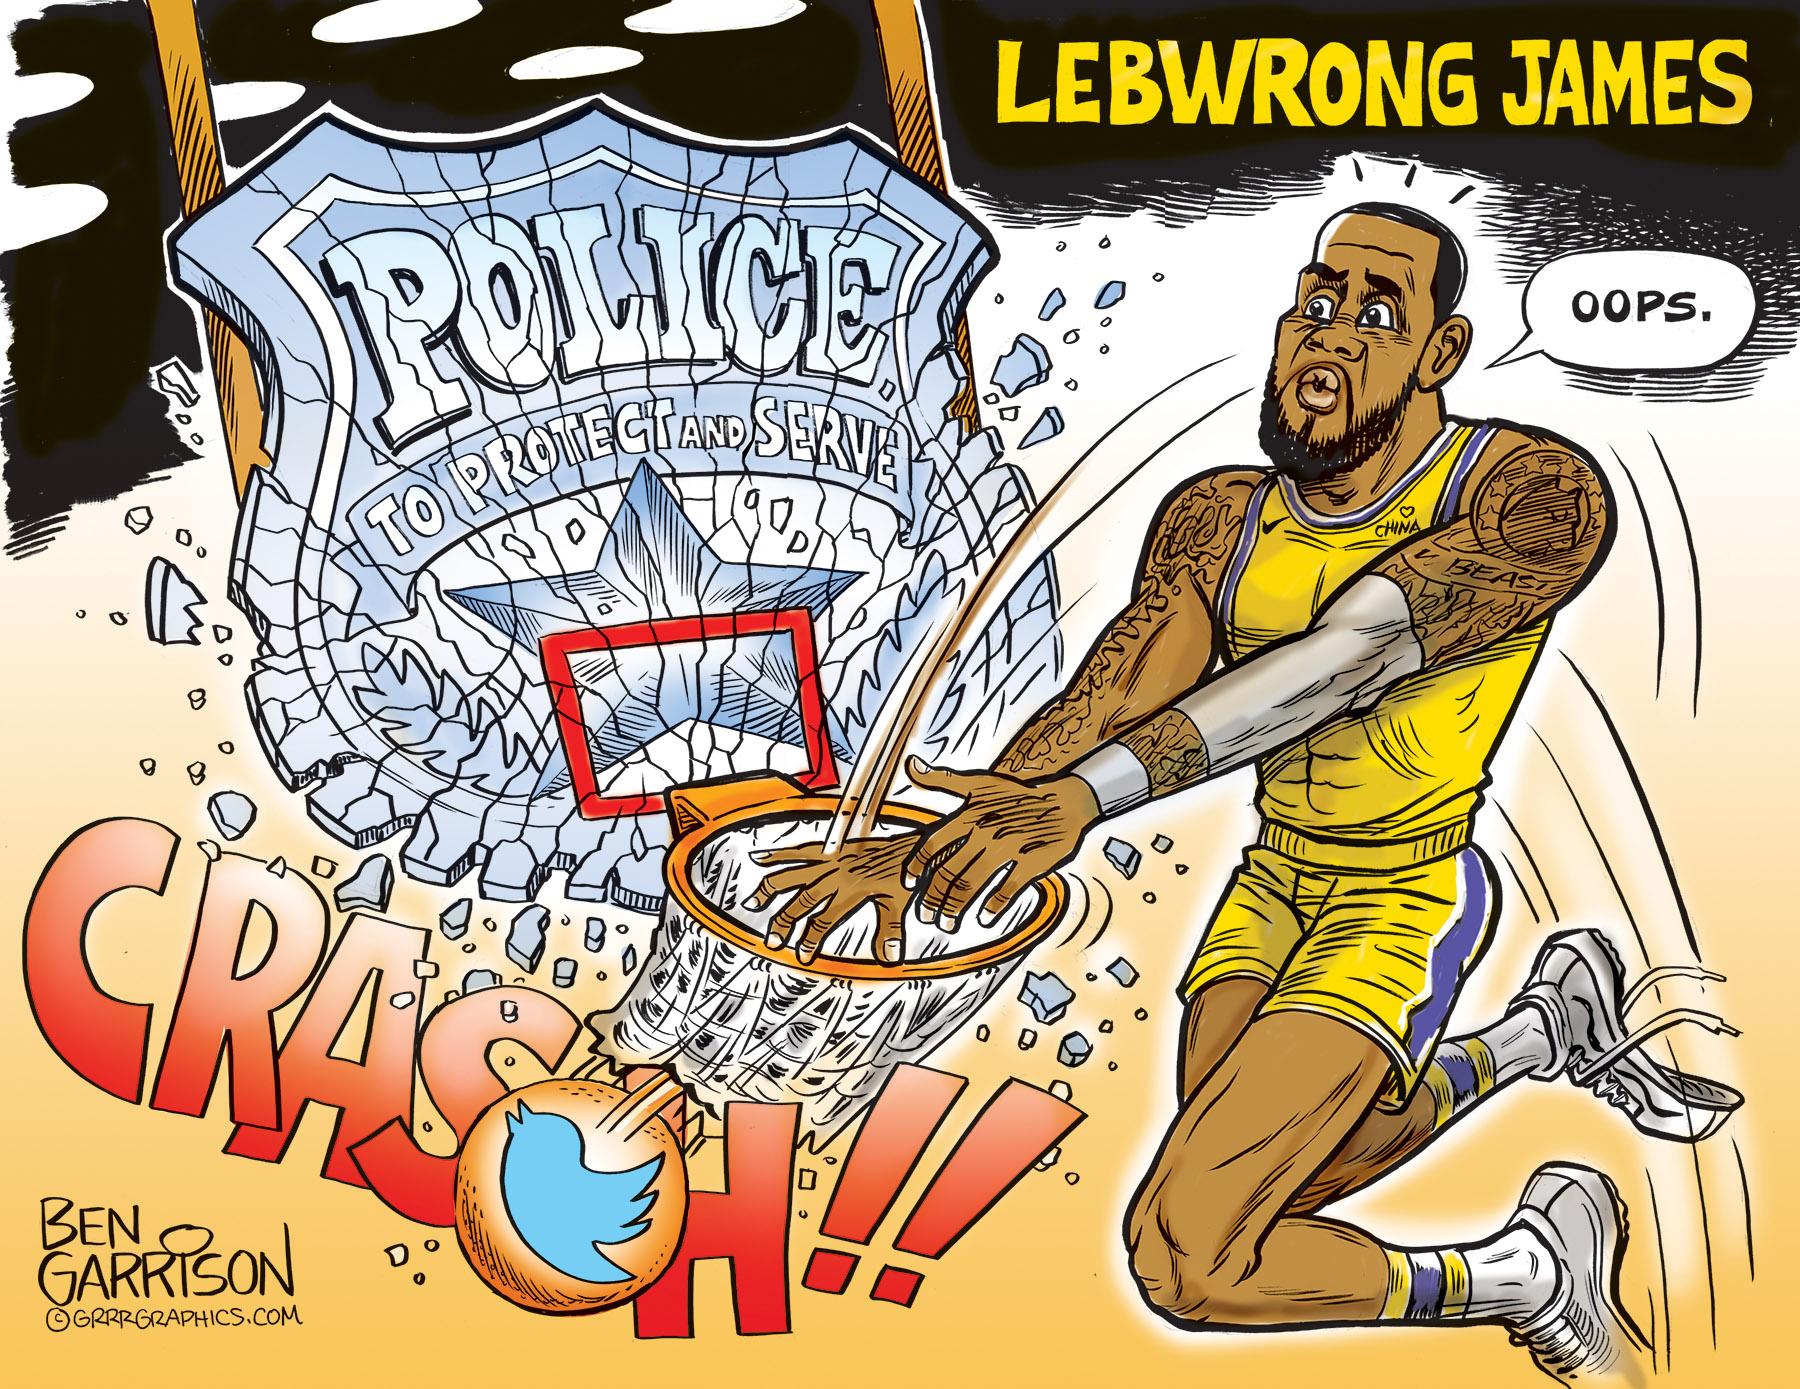 Lebwrong James